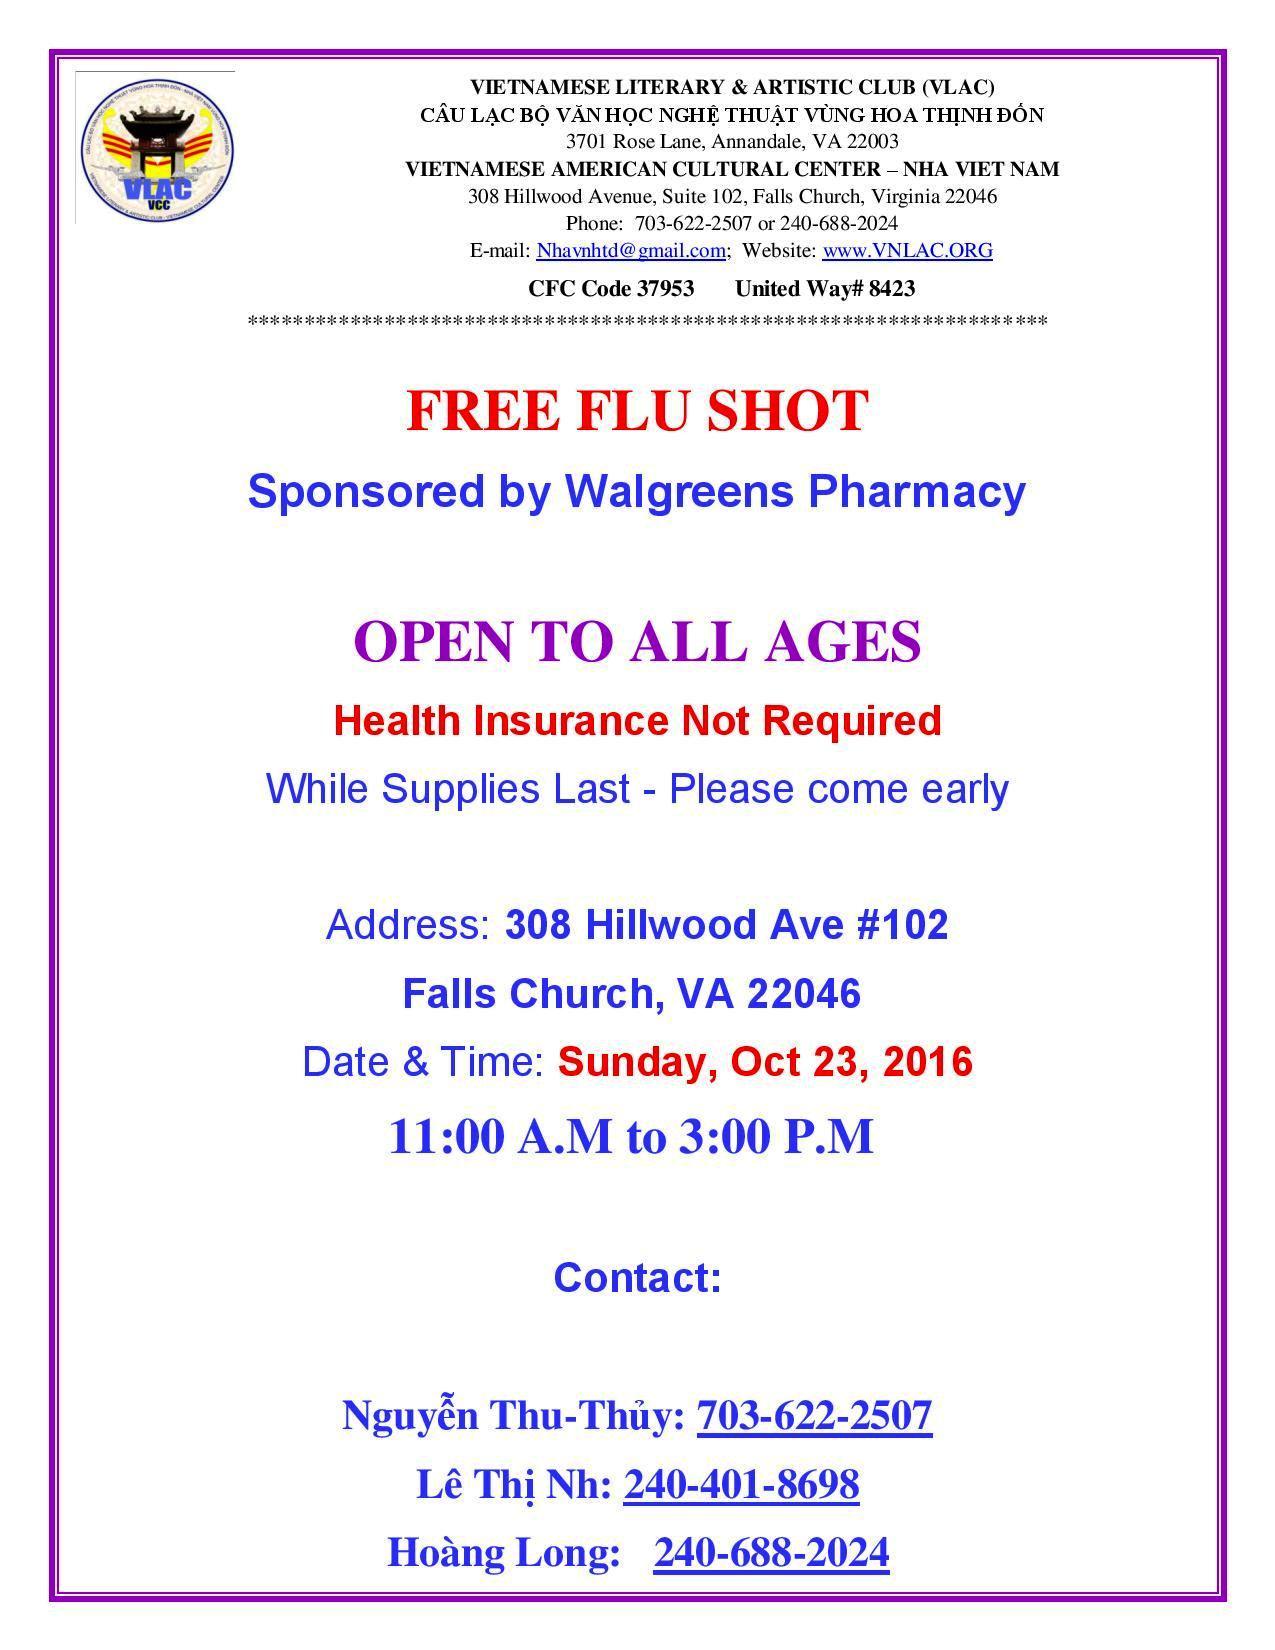 flu-shot-e